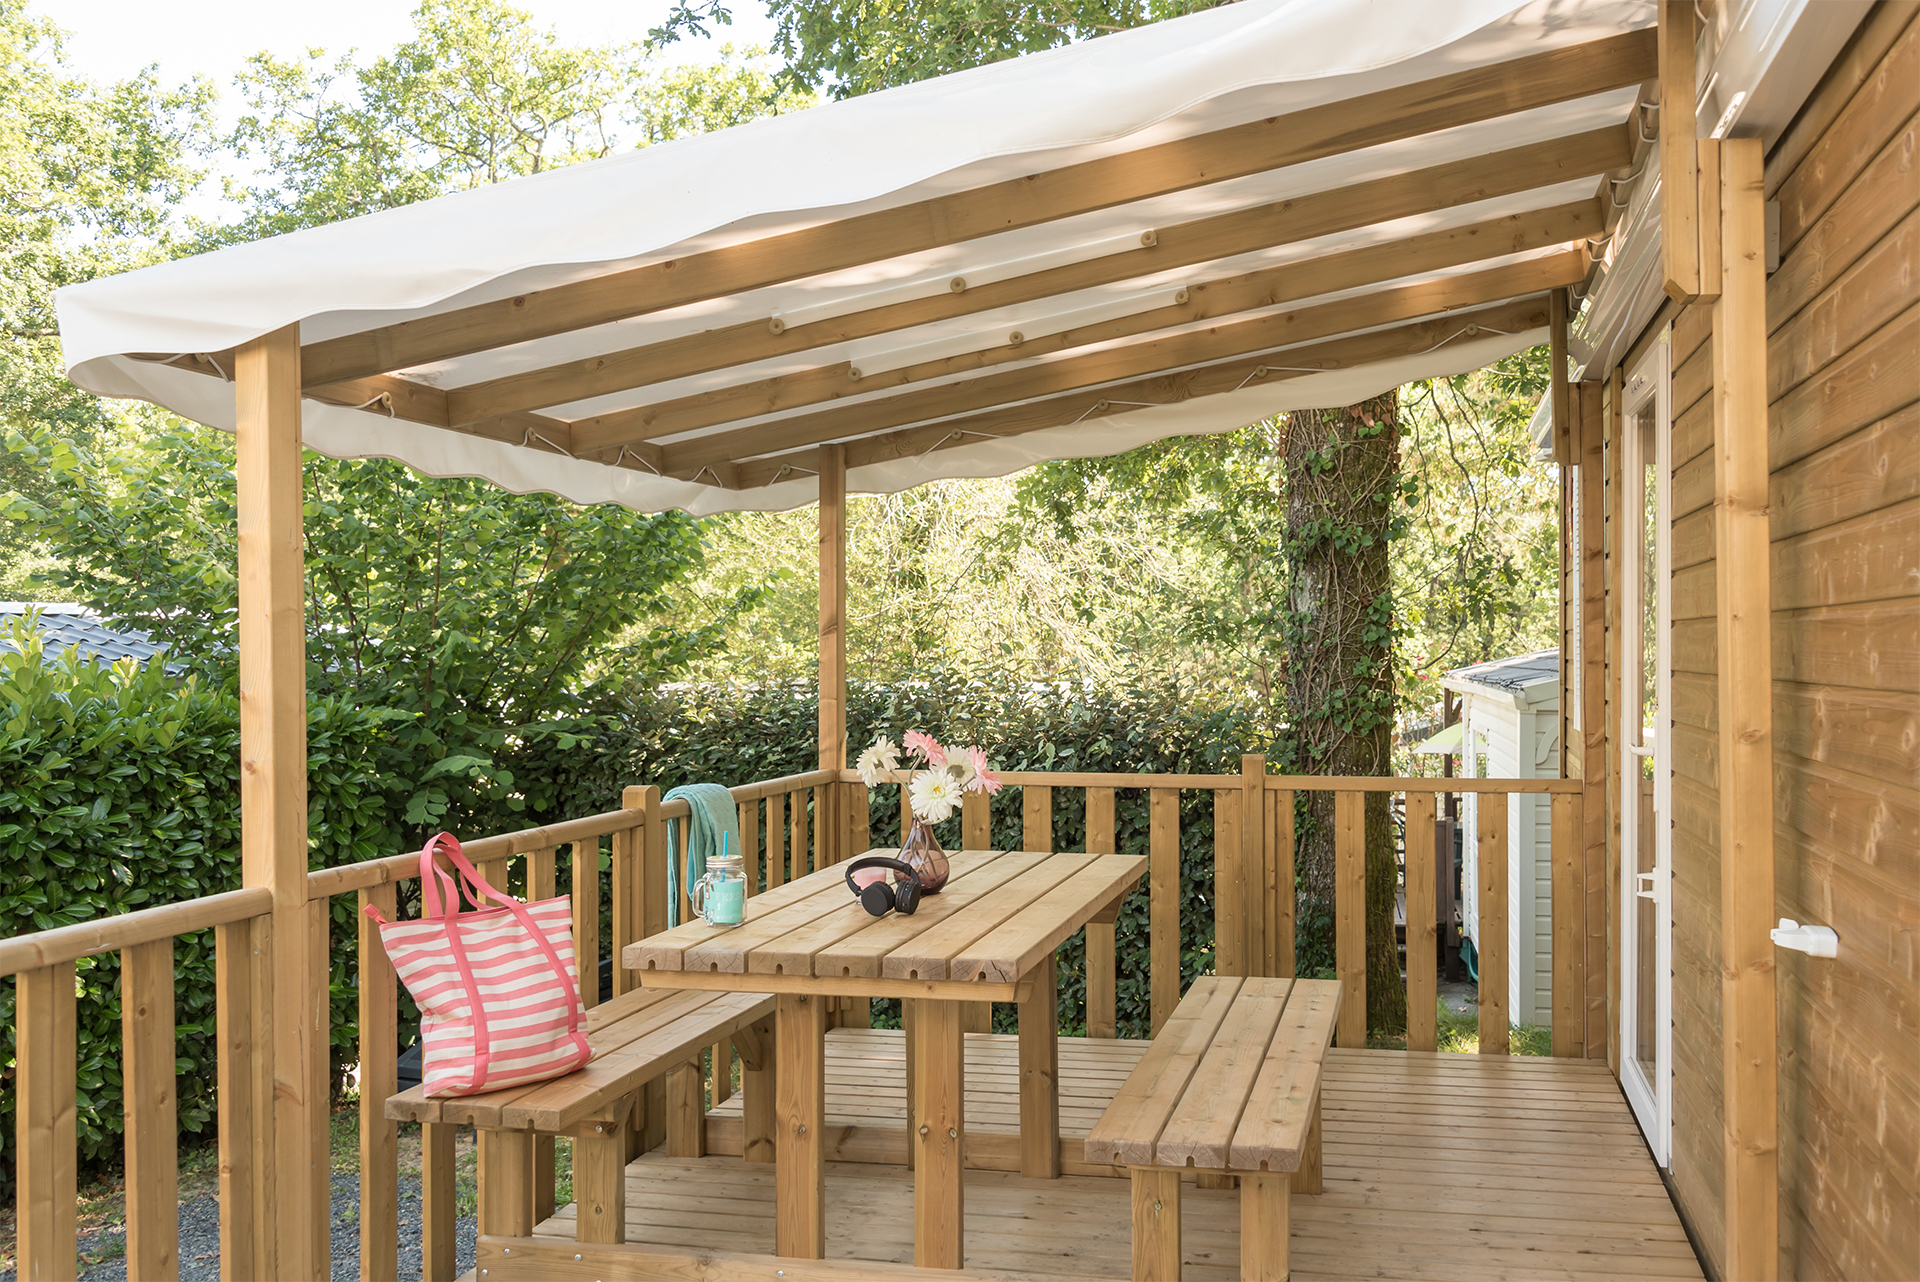 Terrasse en bois camping Pays Basque bord de mer